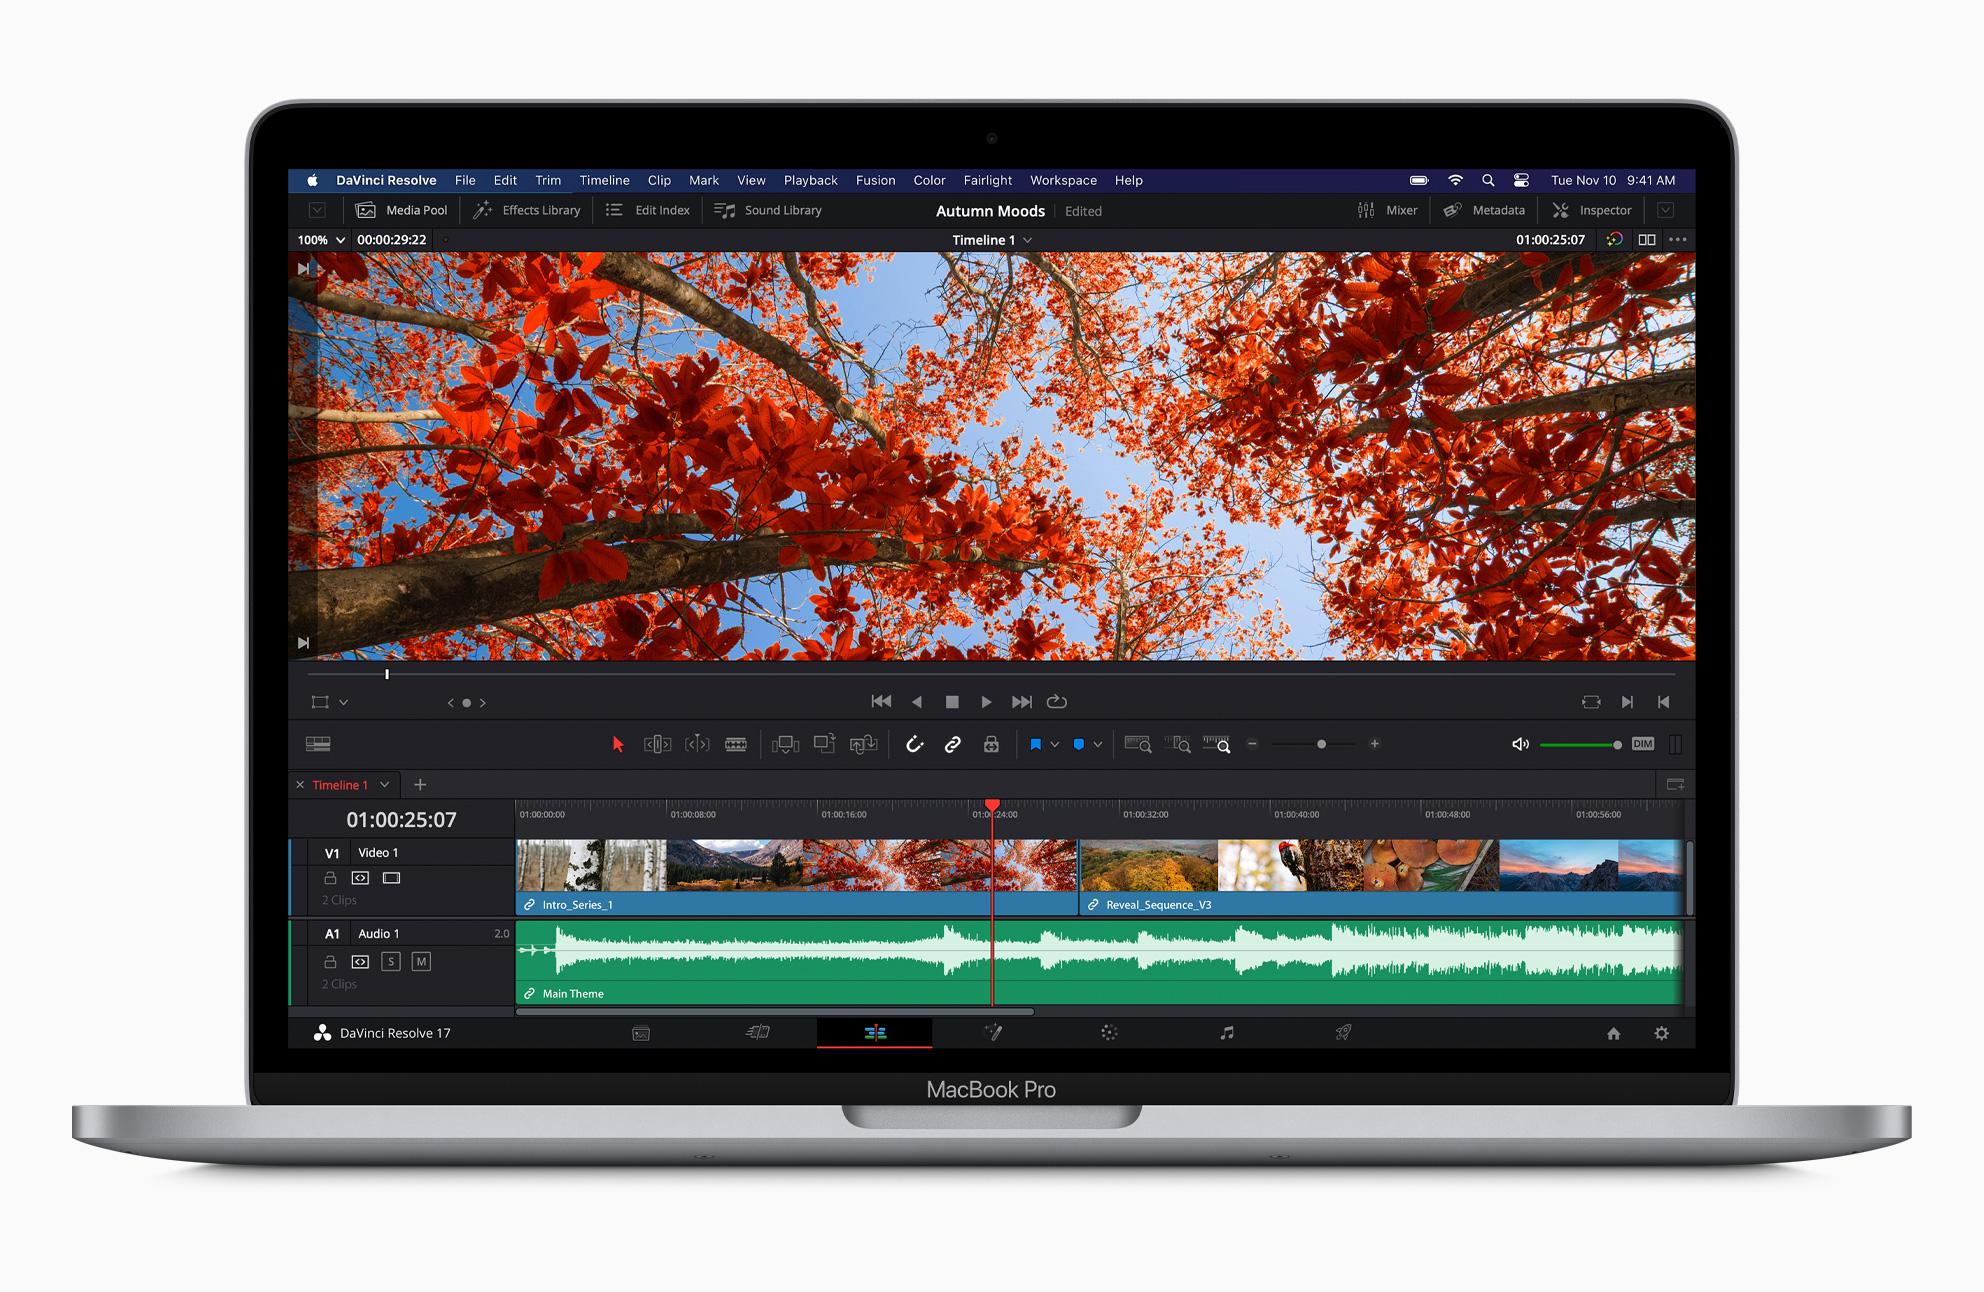 Apple MacBook Pro DaVinci Resolve